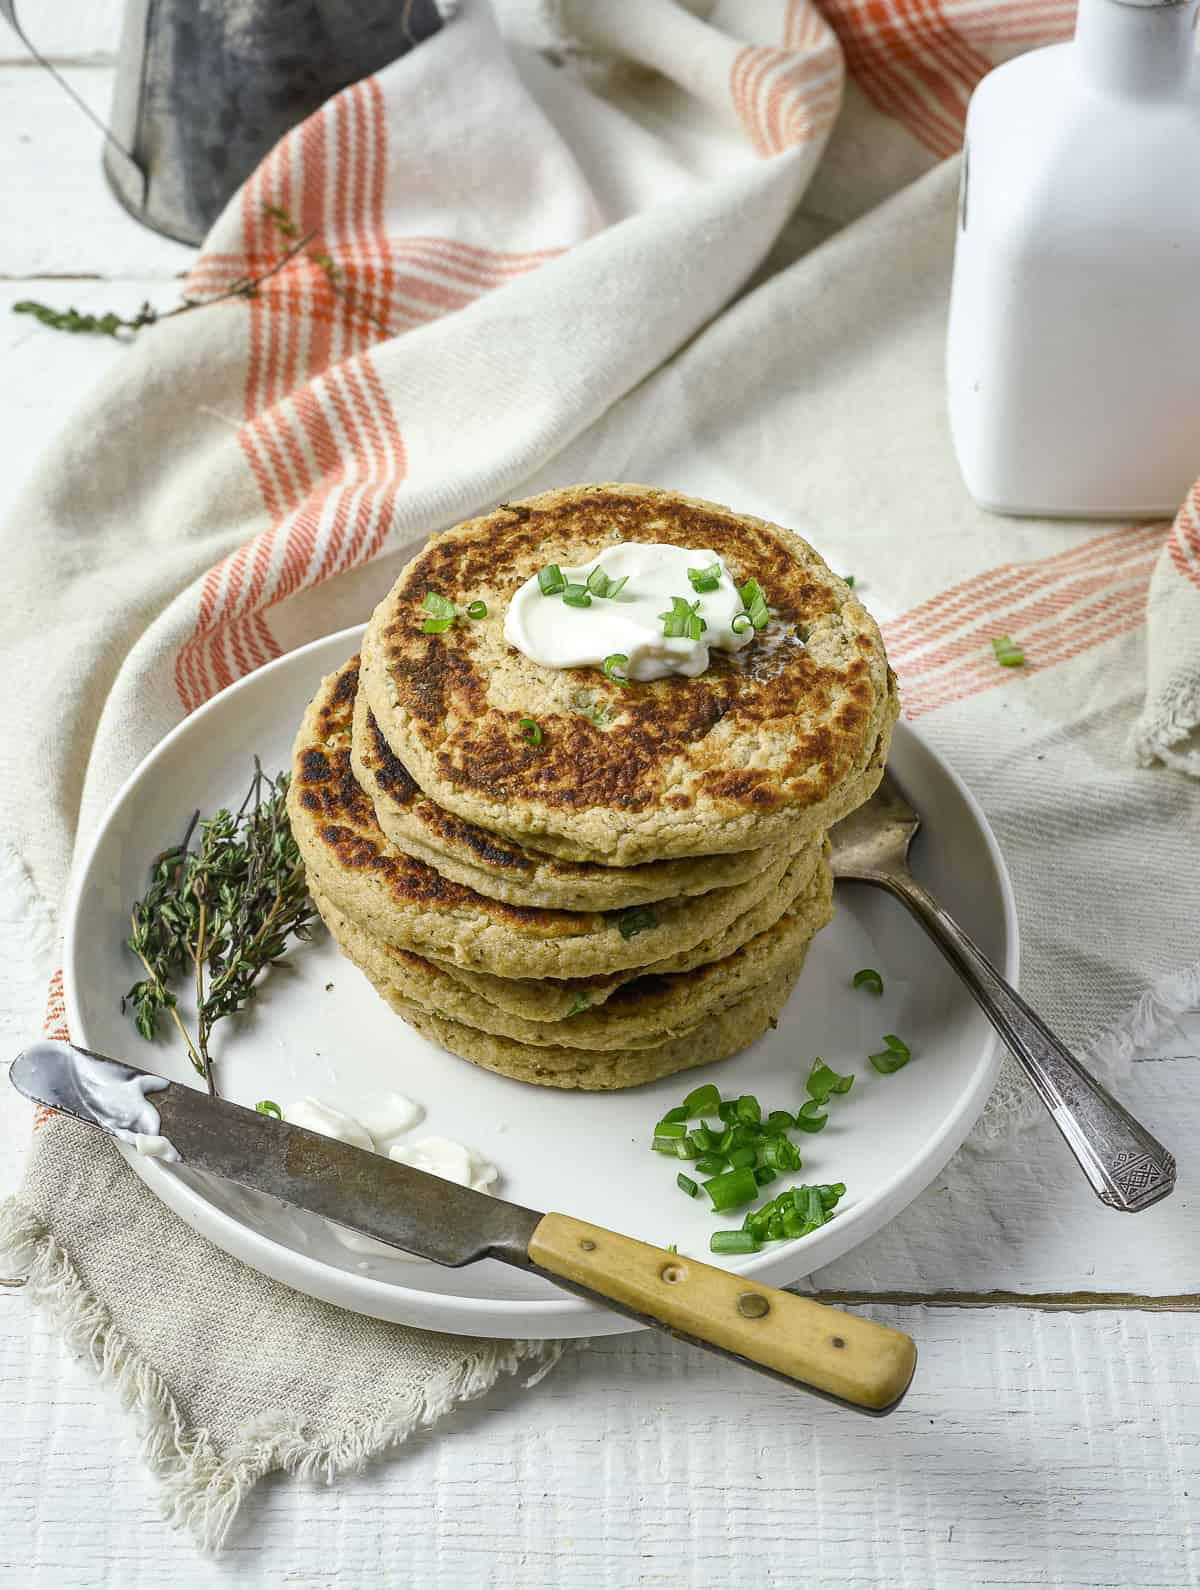 Potato pancakes on plate topped with vegan sour cream